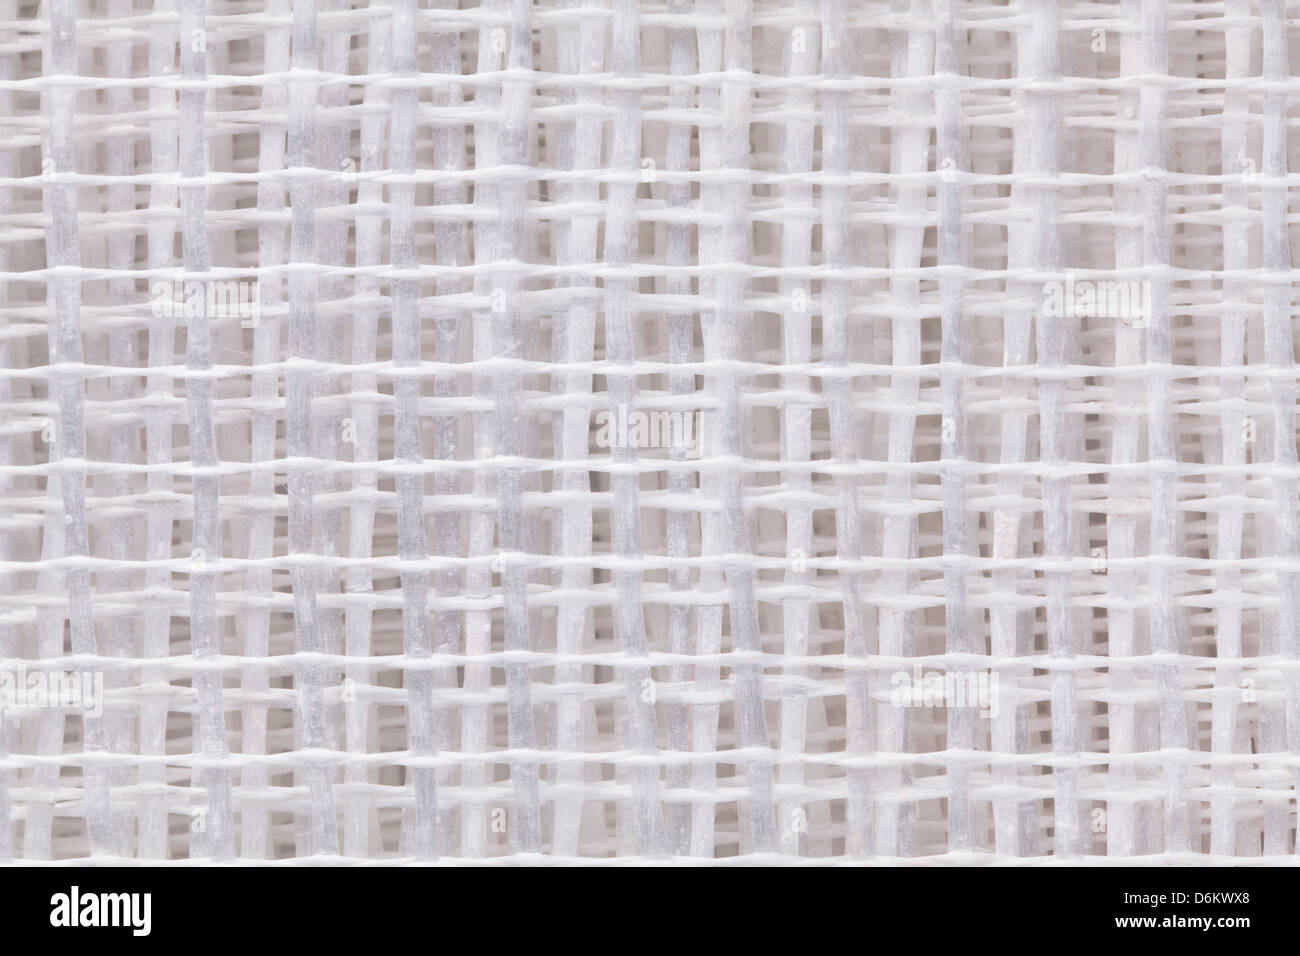 Mesh-Glasfaser Isolierung Textur closeup Stockbild